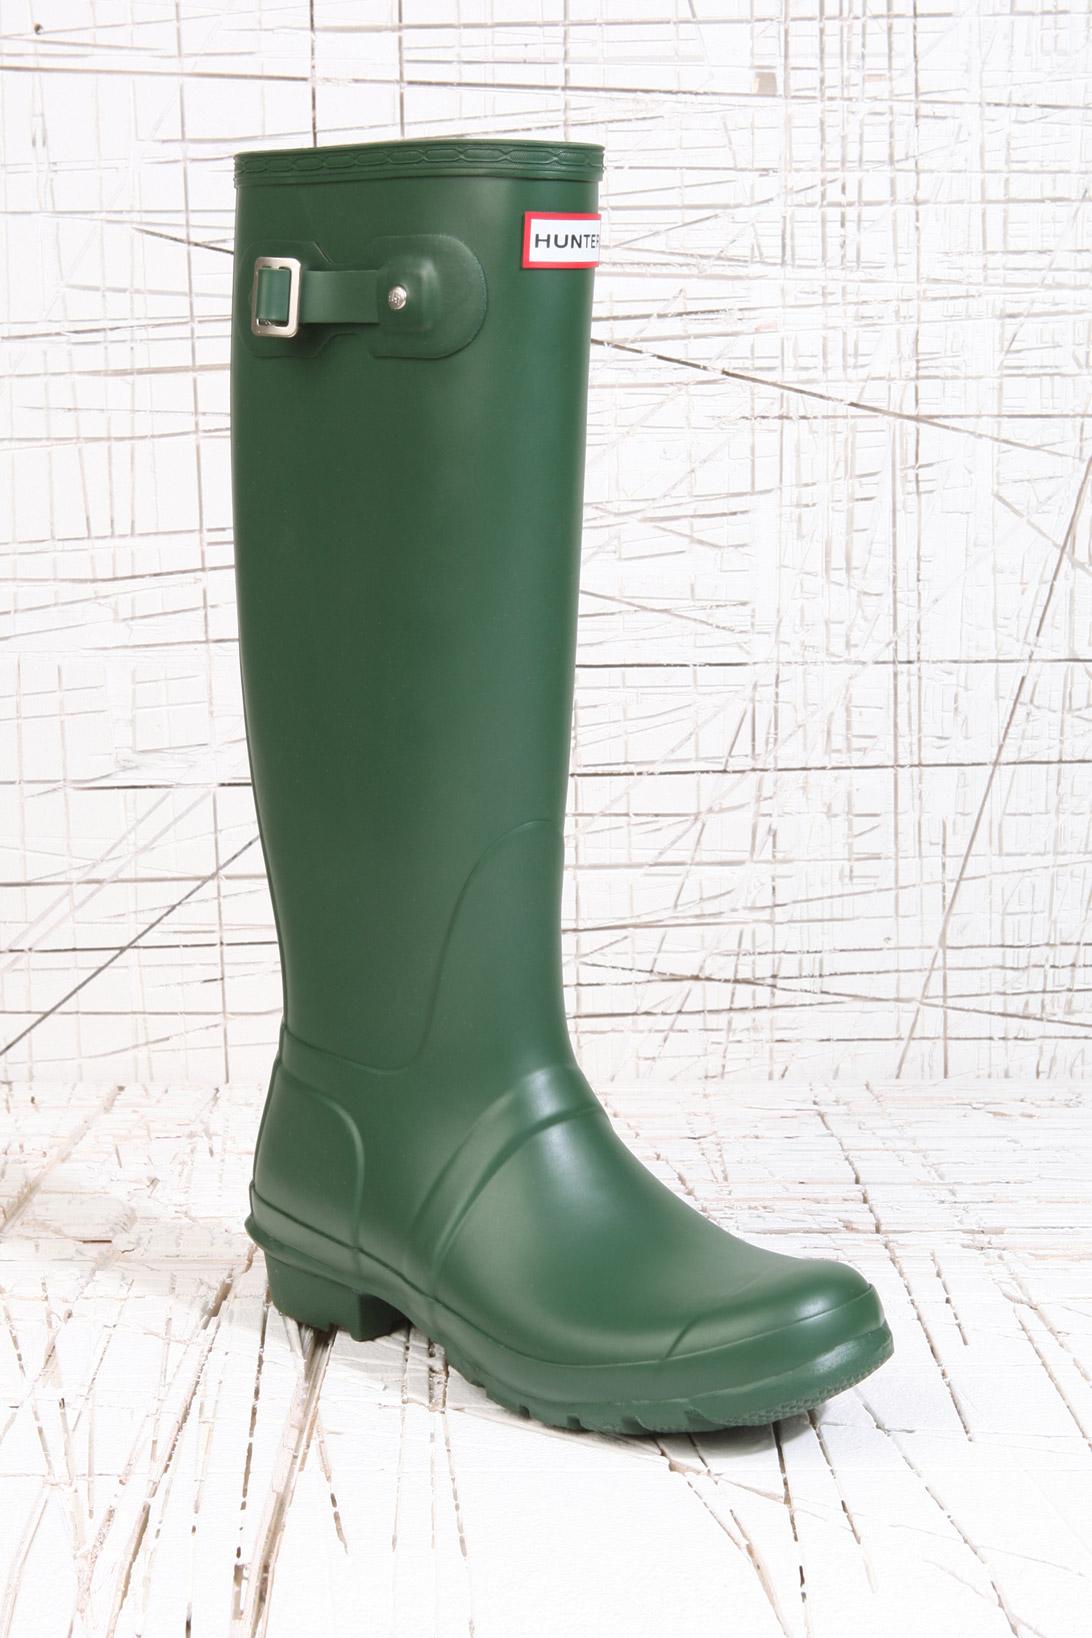 Hunter-Original-bottes-caoutchouc-Vert-lecatalog.com